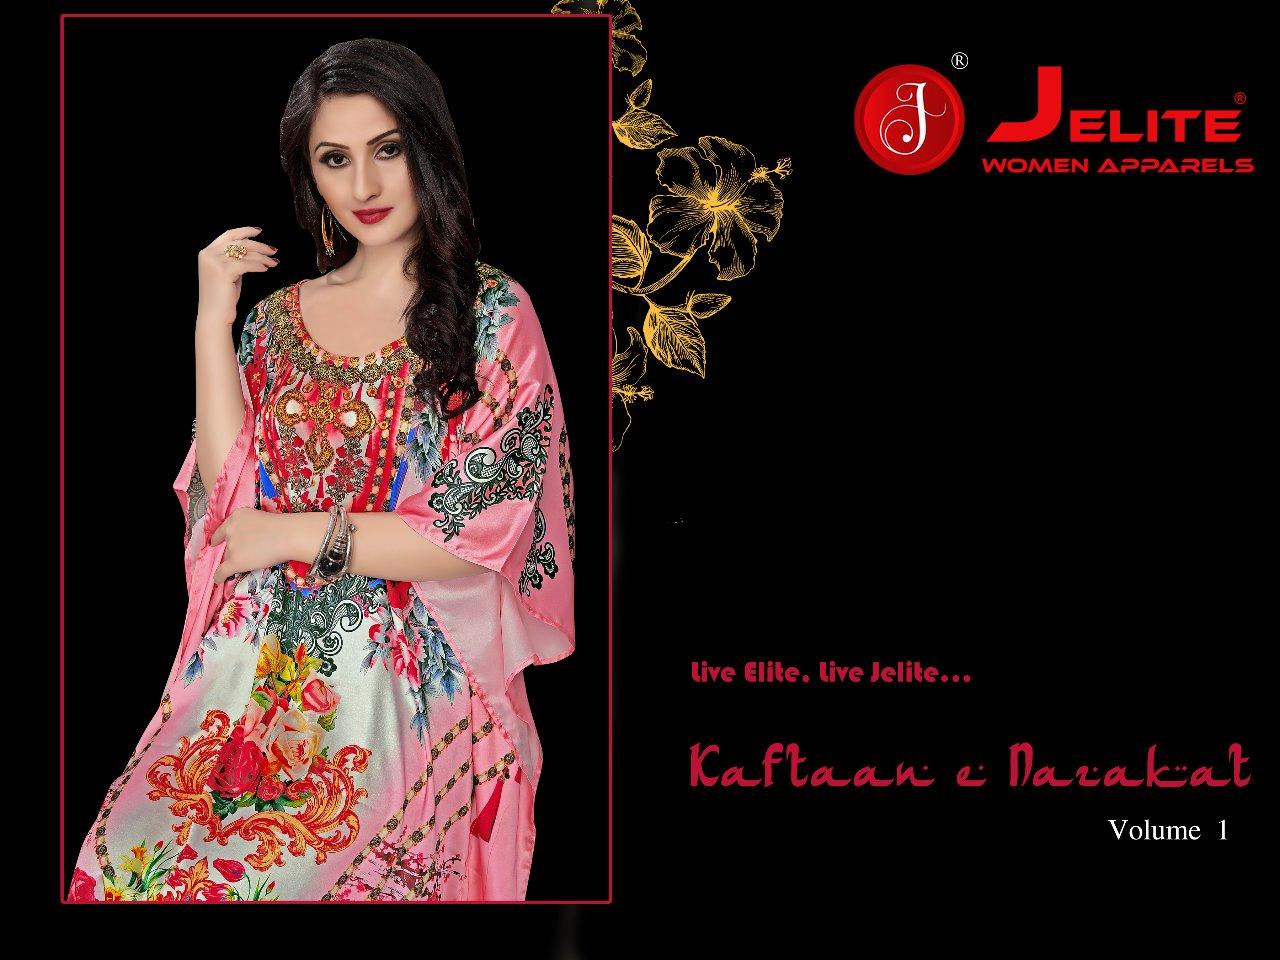 jelite kaftan e nazakat colorful ready to wear kaftans collection